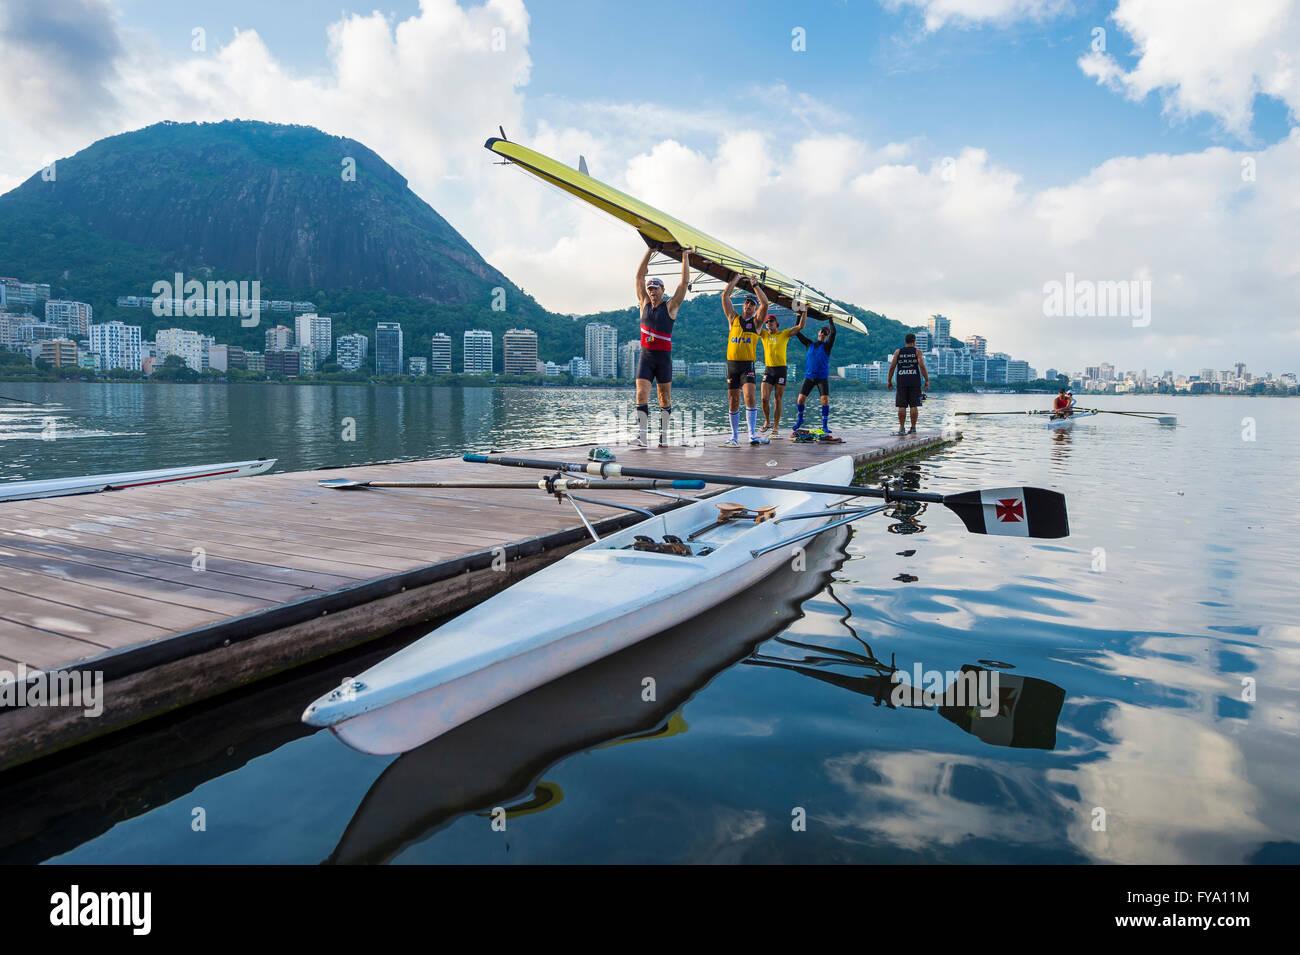 RIO DE JANEIRO - 1 de abril de 2016: Los miembros del club de remo de Vasco da Gama llevar su barco a Lagoa Rodrigo Imagen De Stock